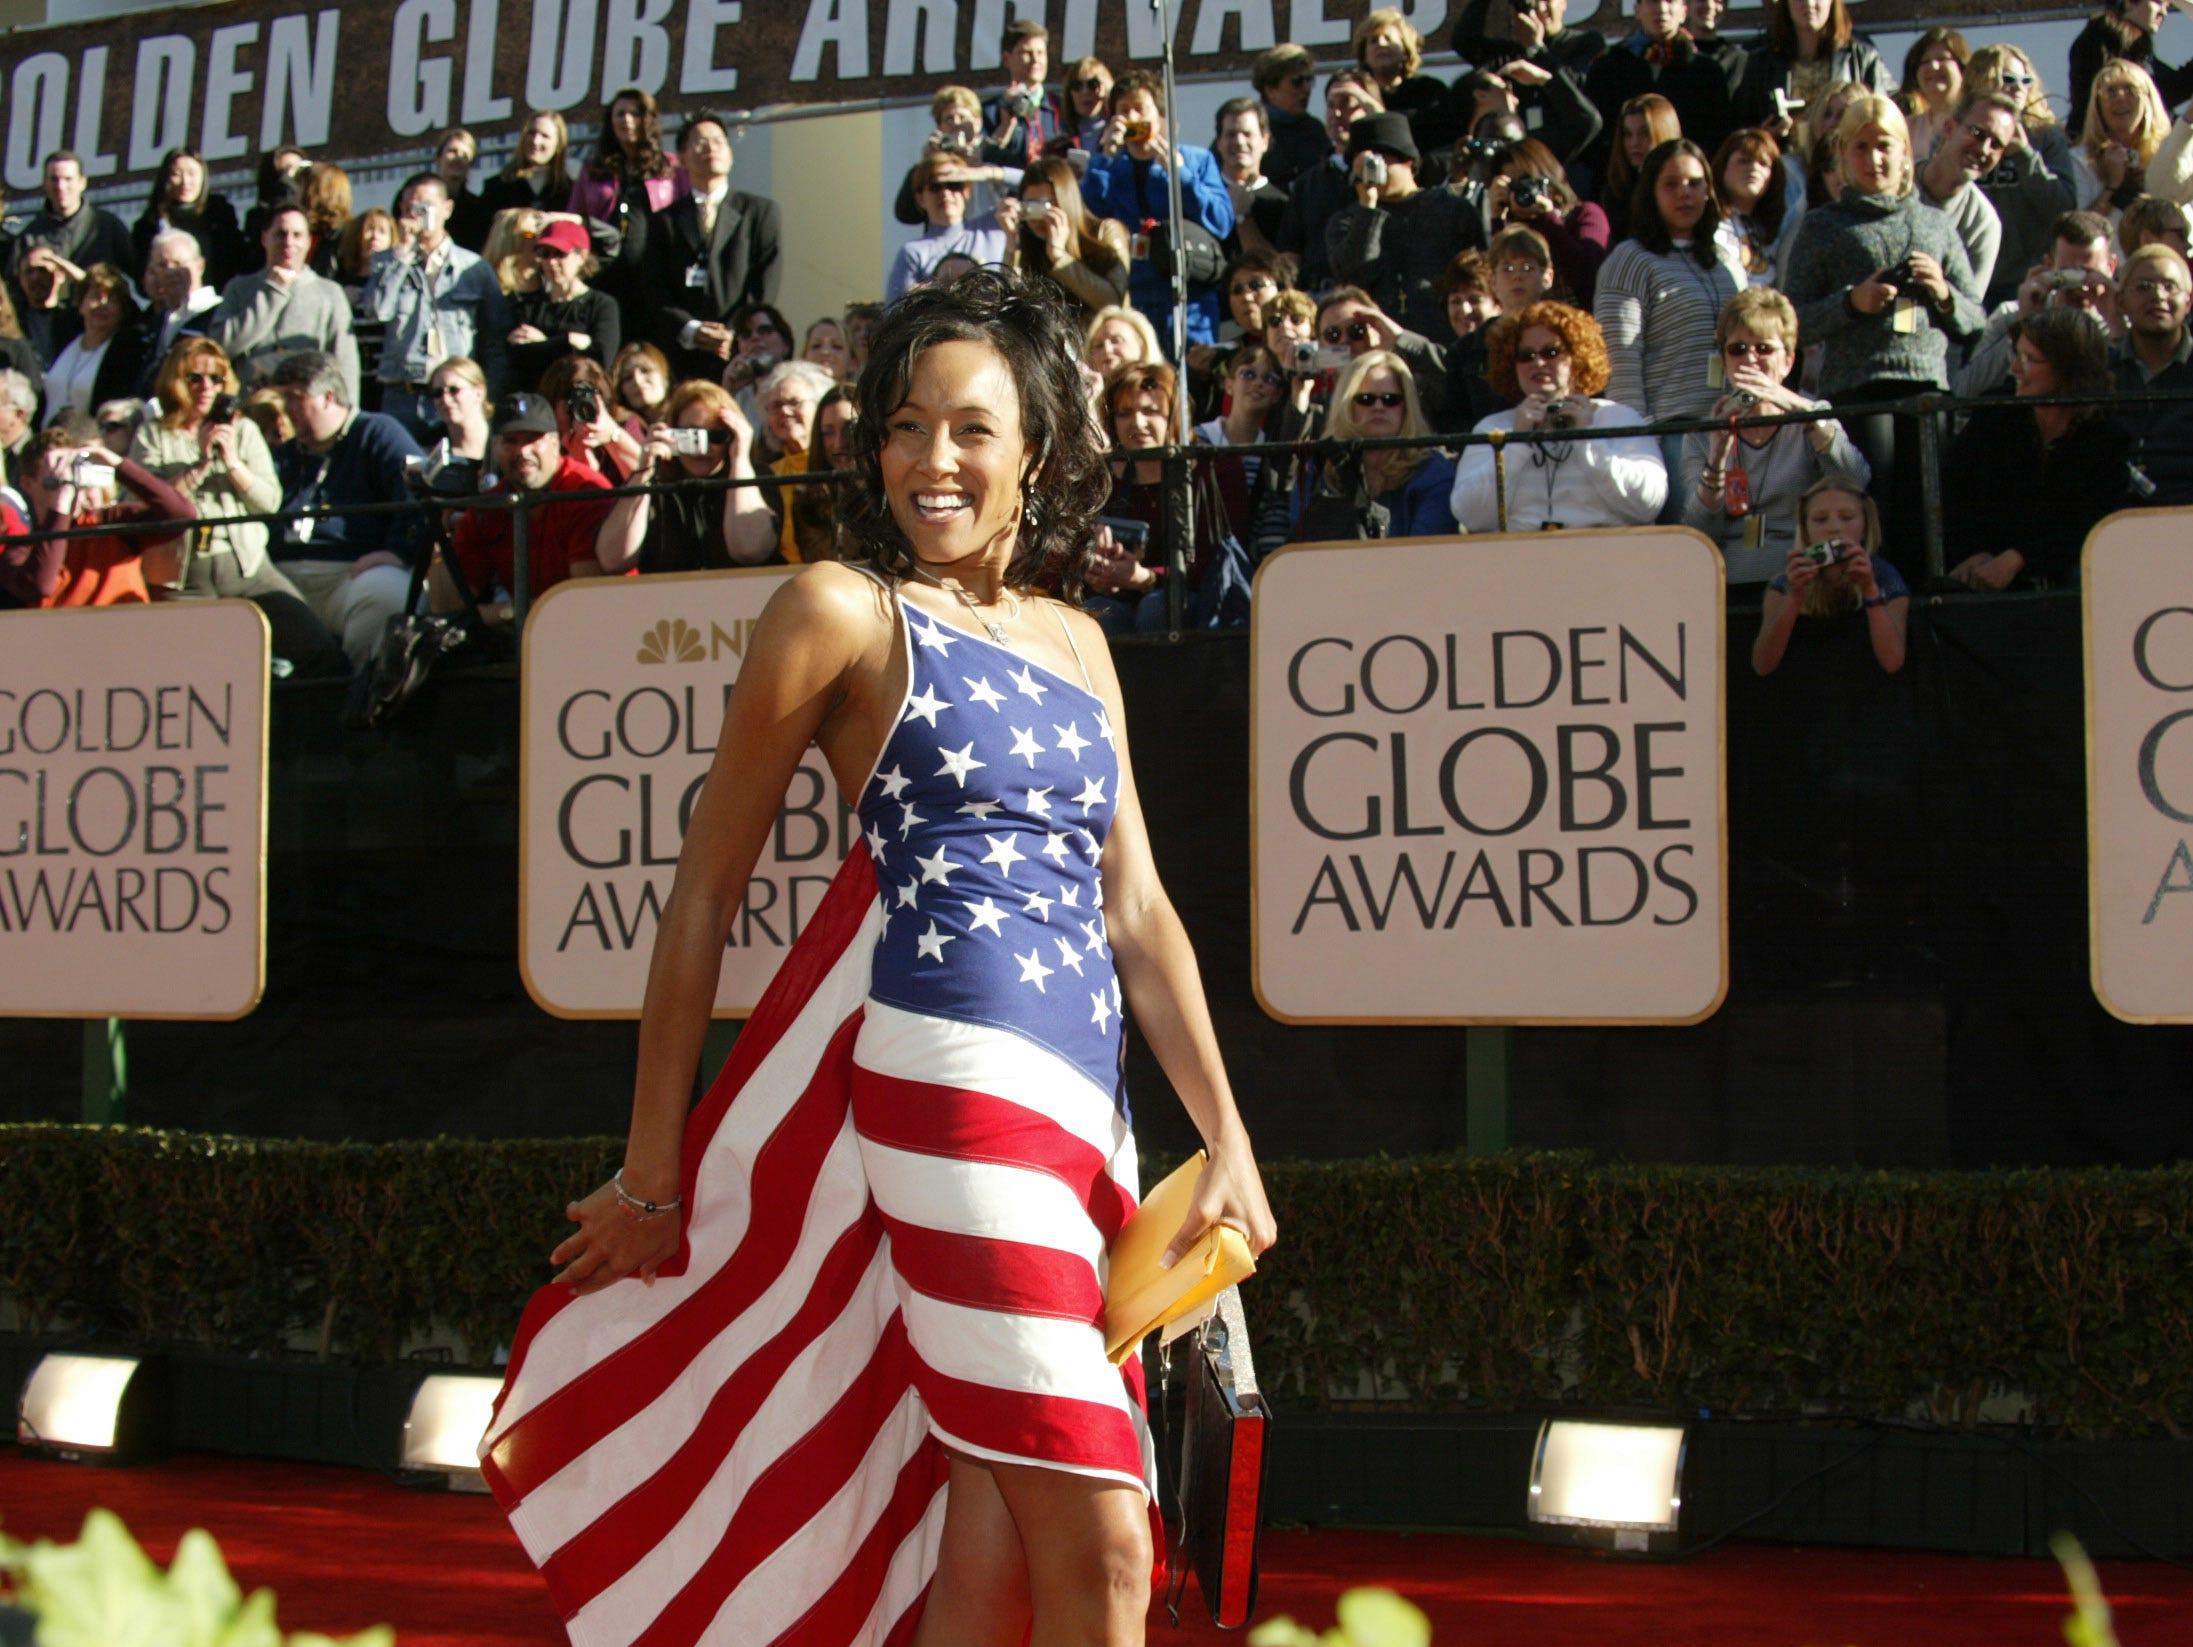 January 20, 2002 - Los Angeles, CA -- Golden Globe Awards --    Cynthia Garret arrives at the 59th annual Golden Globe Awards.